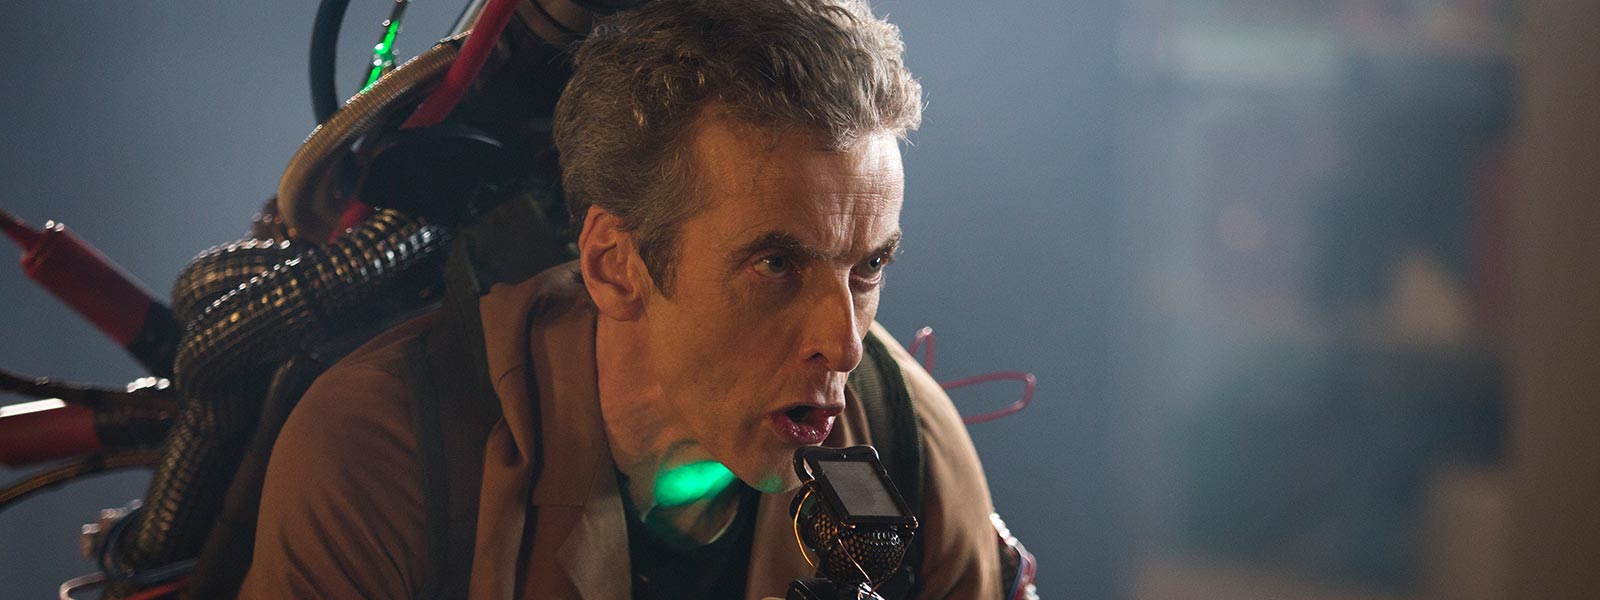 doctor-who-episode-806-doctor-capaldi-800×600